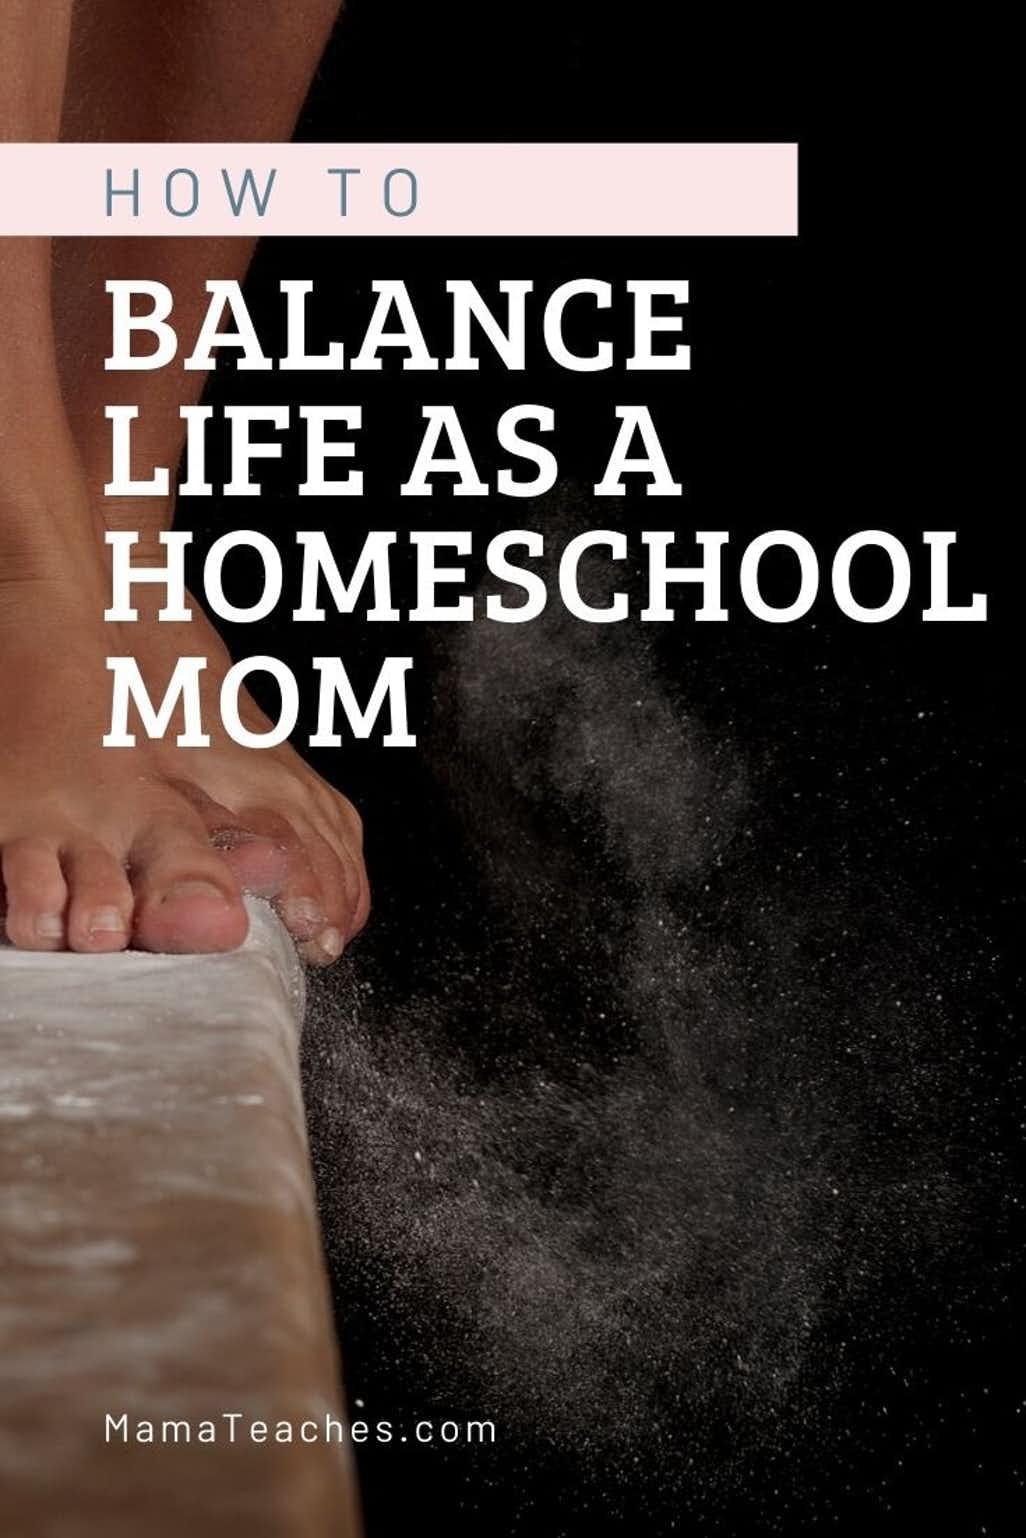 How to Balance Life as a Homeschool Mom